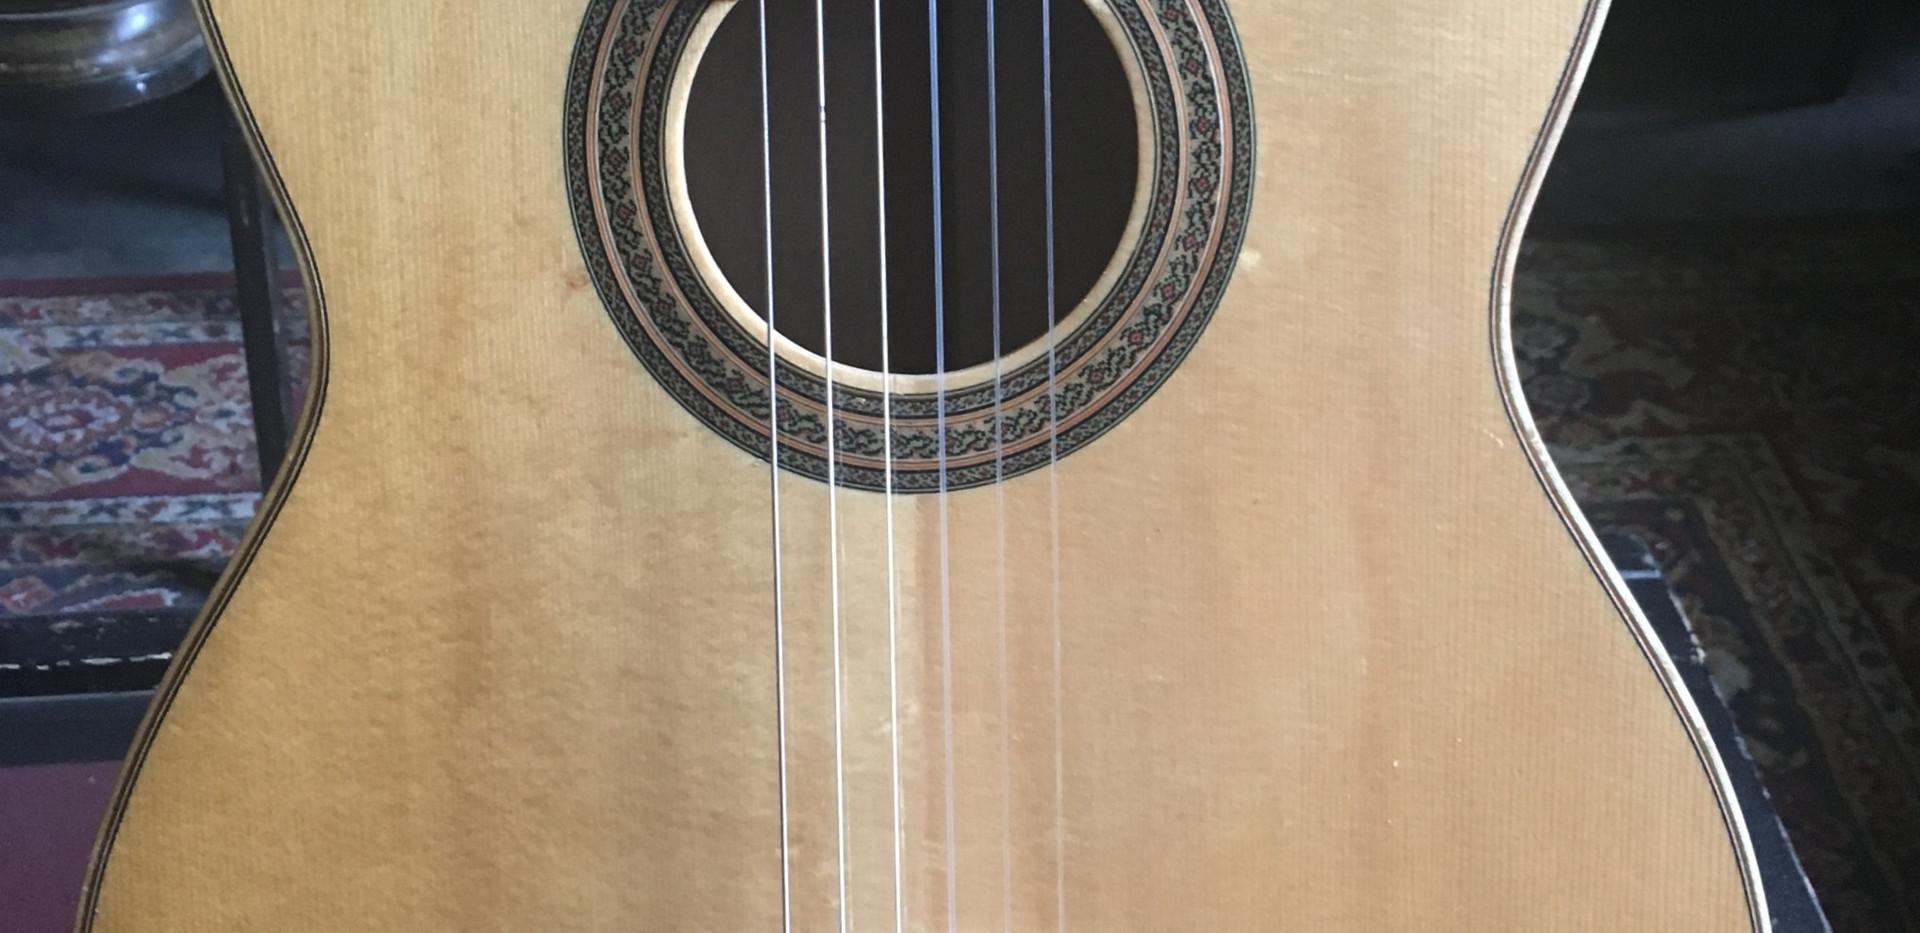 Imported Paracho classical guitar